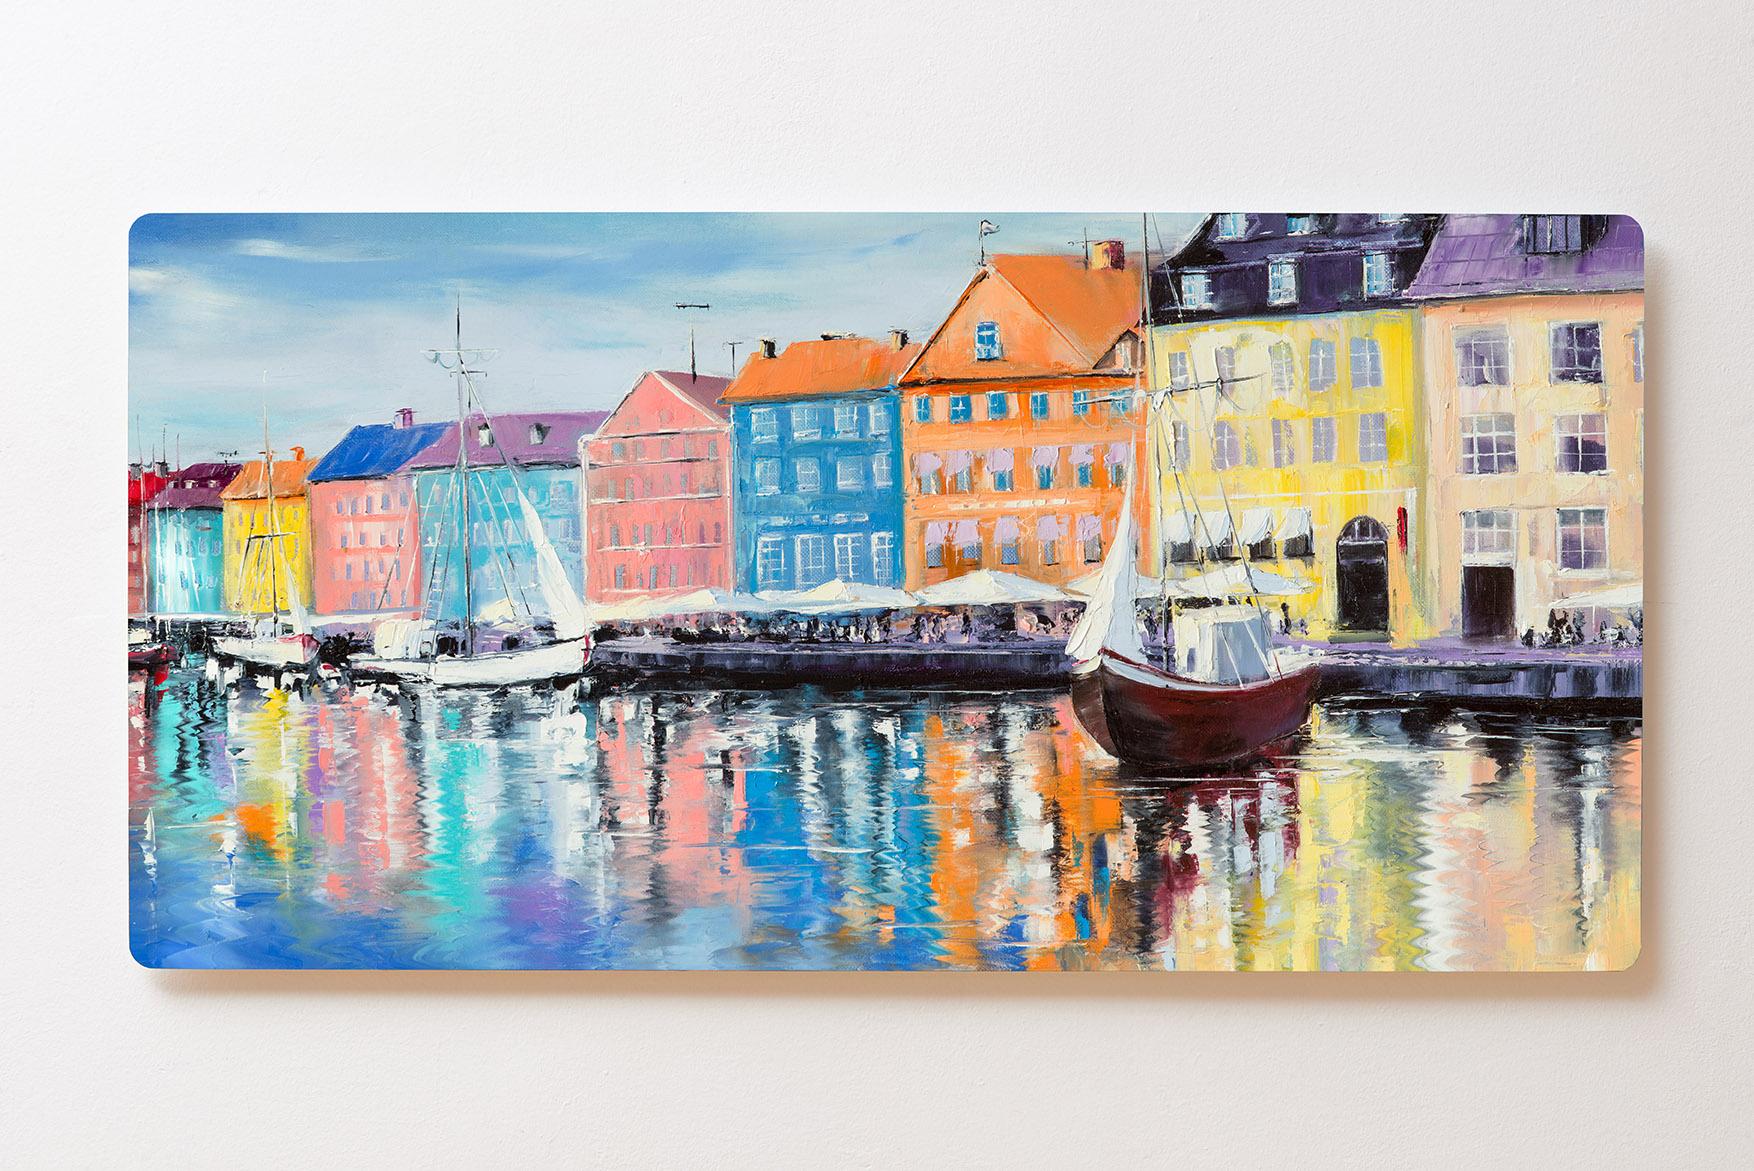 Magnettafel BACKLIGHT 120x60cm Motiv-Wandbild M137 Gemälde Stockholm